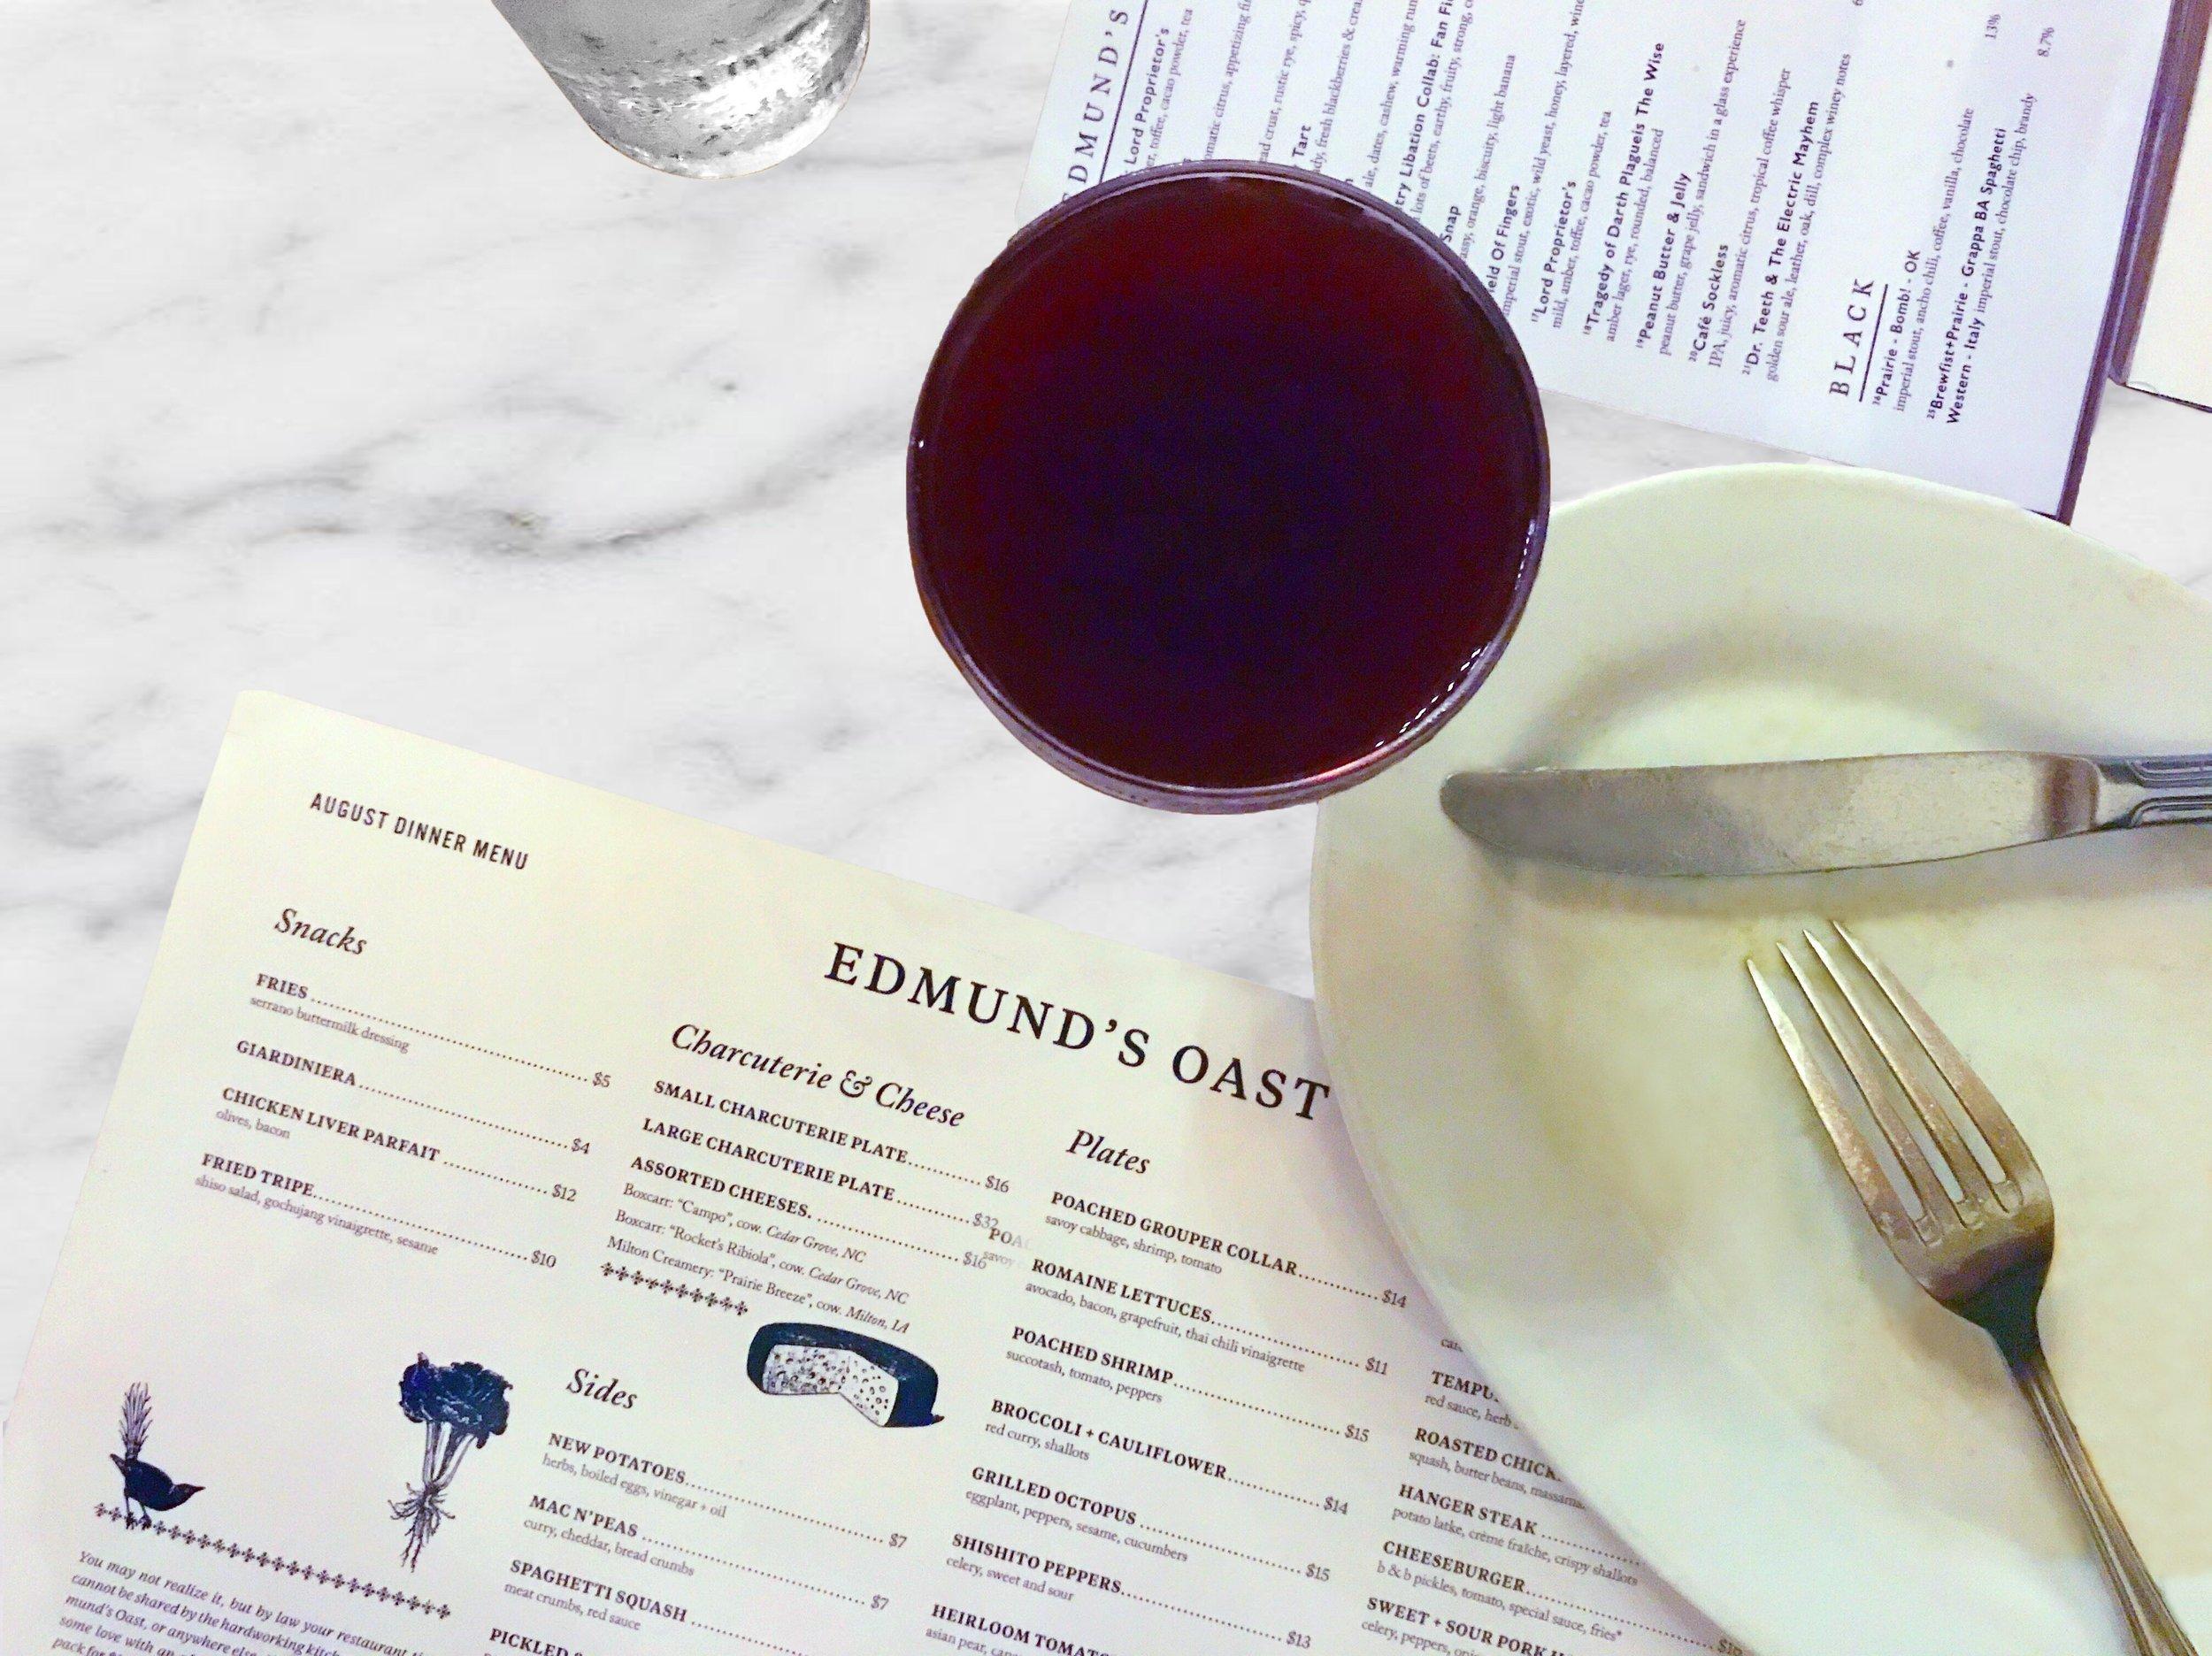 edmund's oast charleston